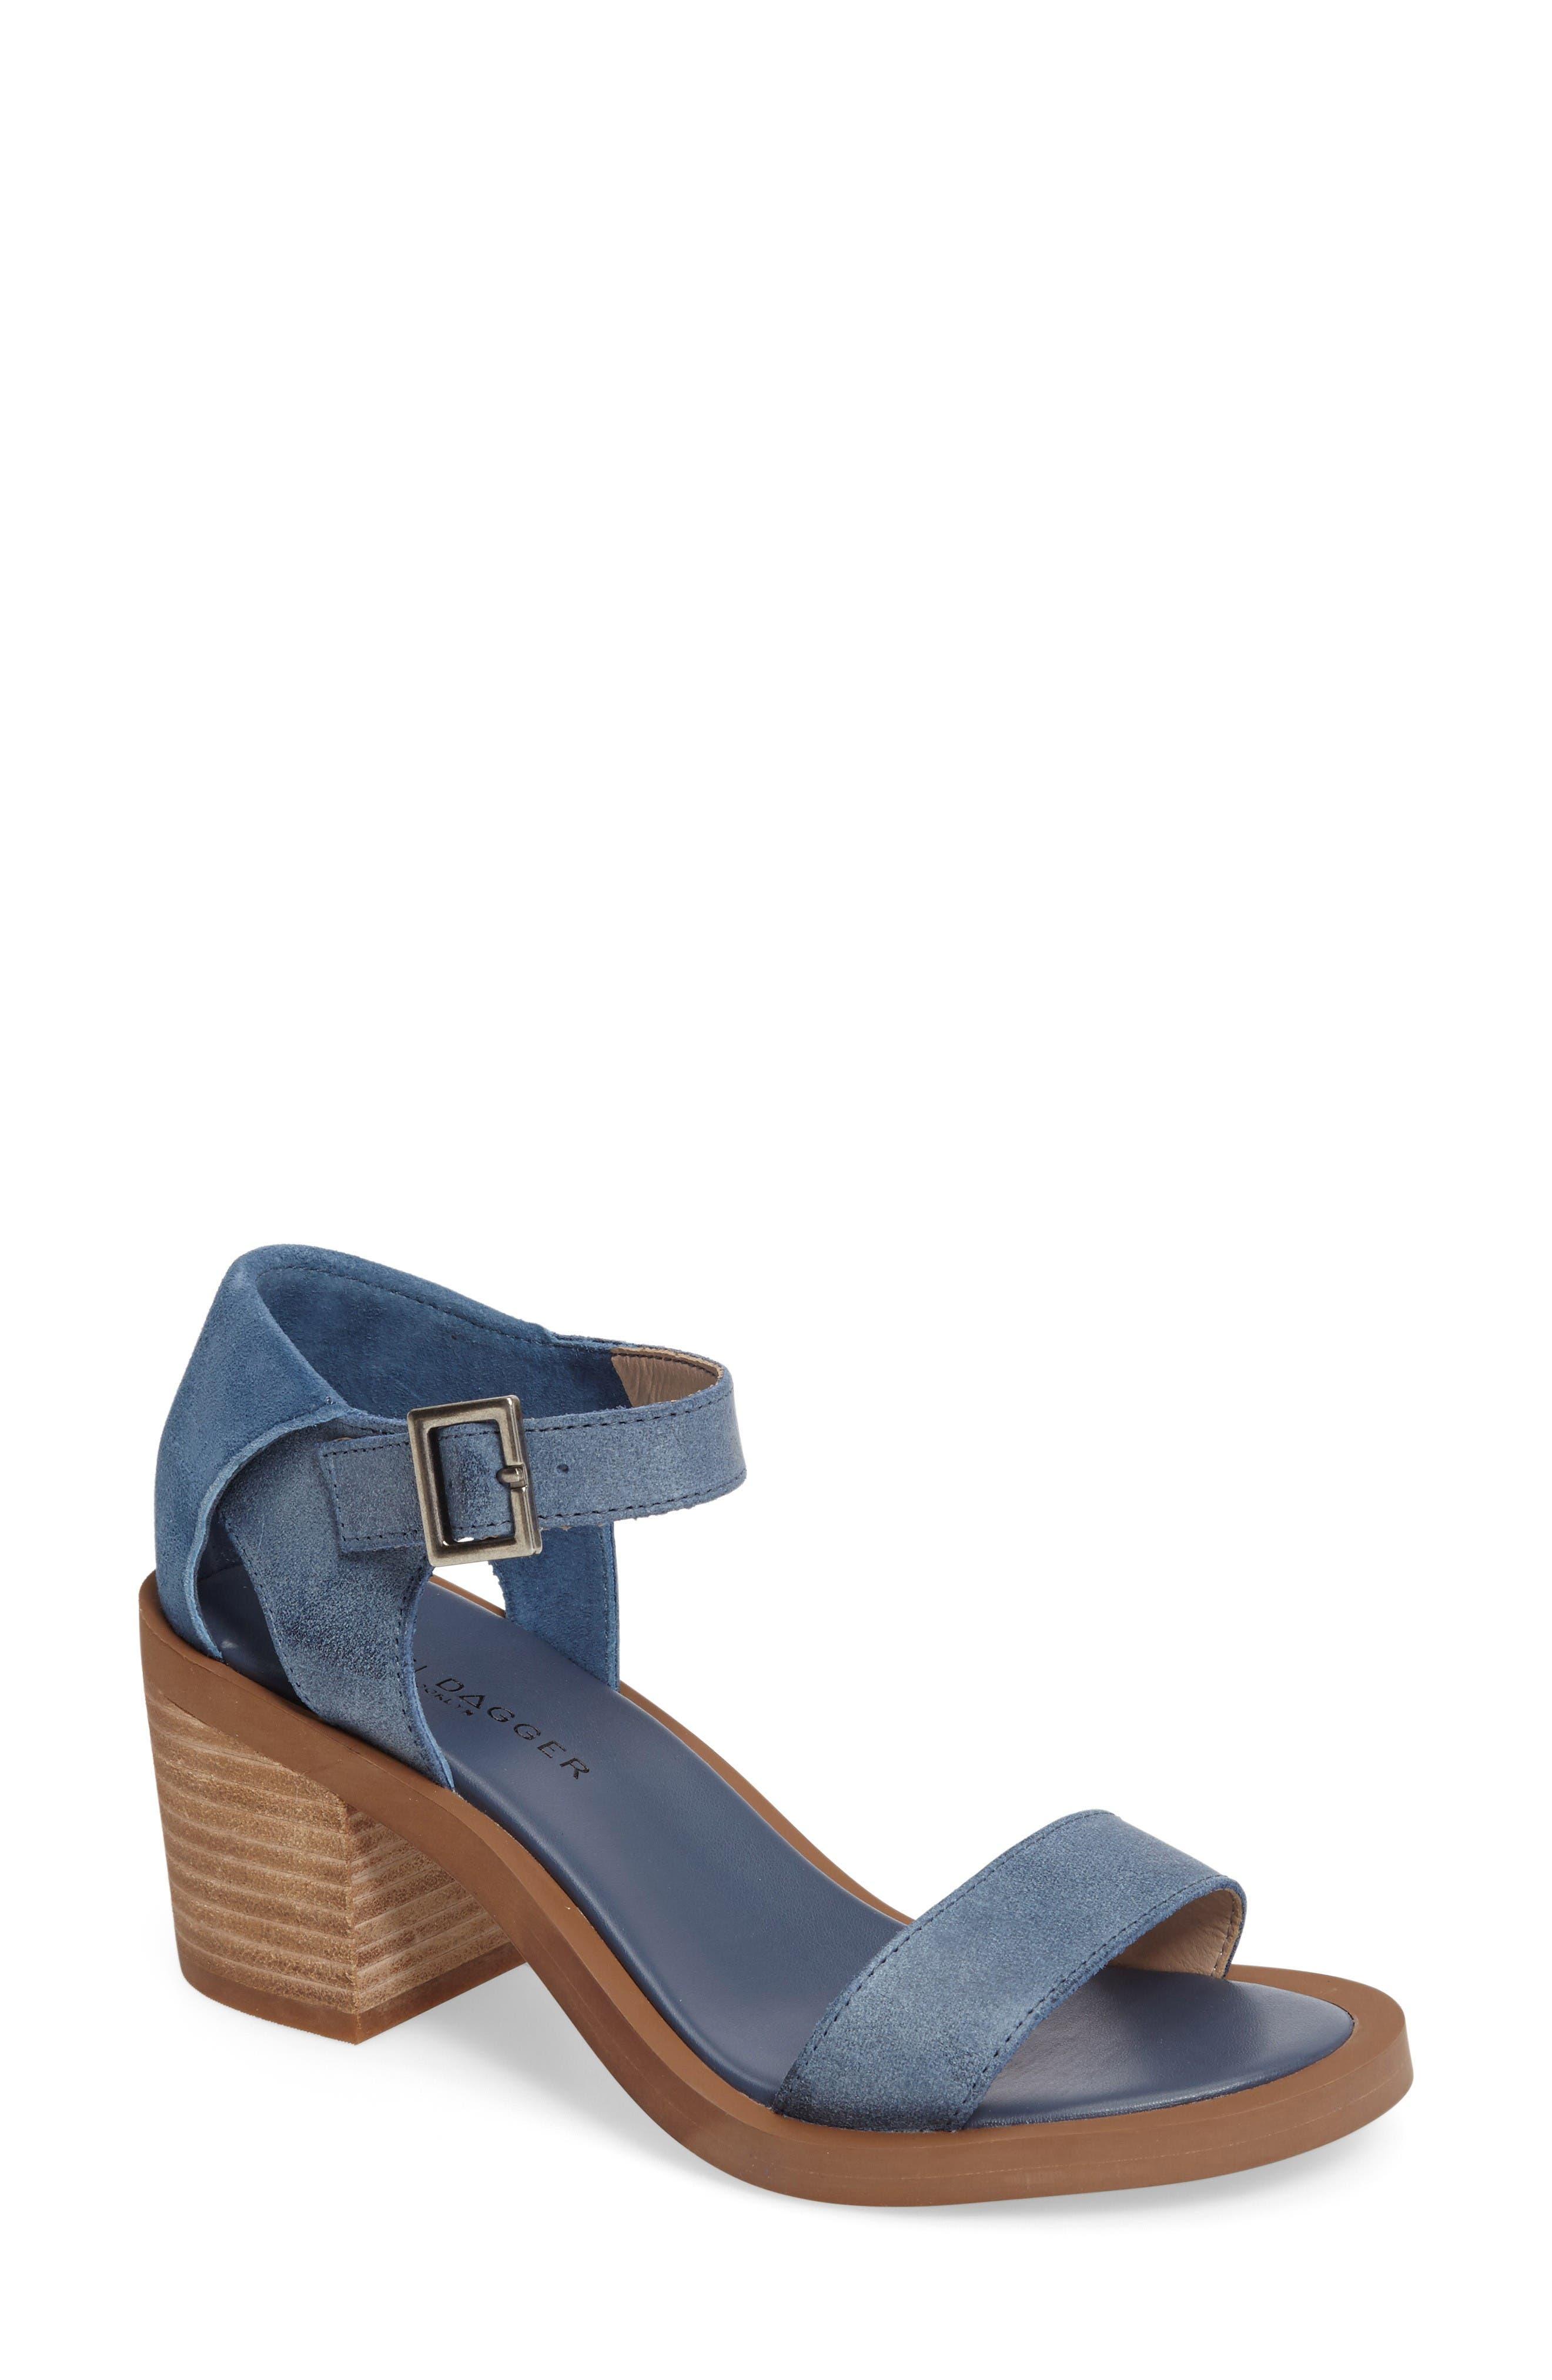 Main Image - Kelsi Dagger Brooklyn Linden Block Heel Sandal (Women)